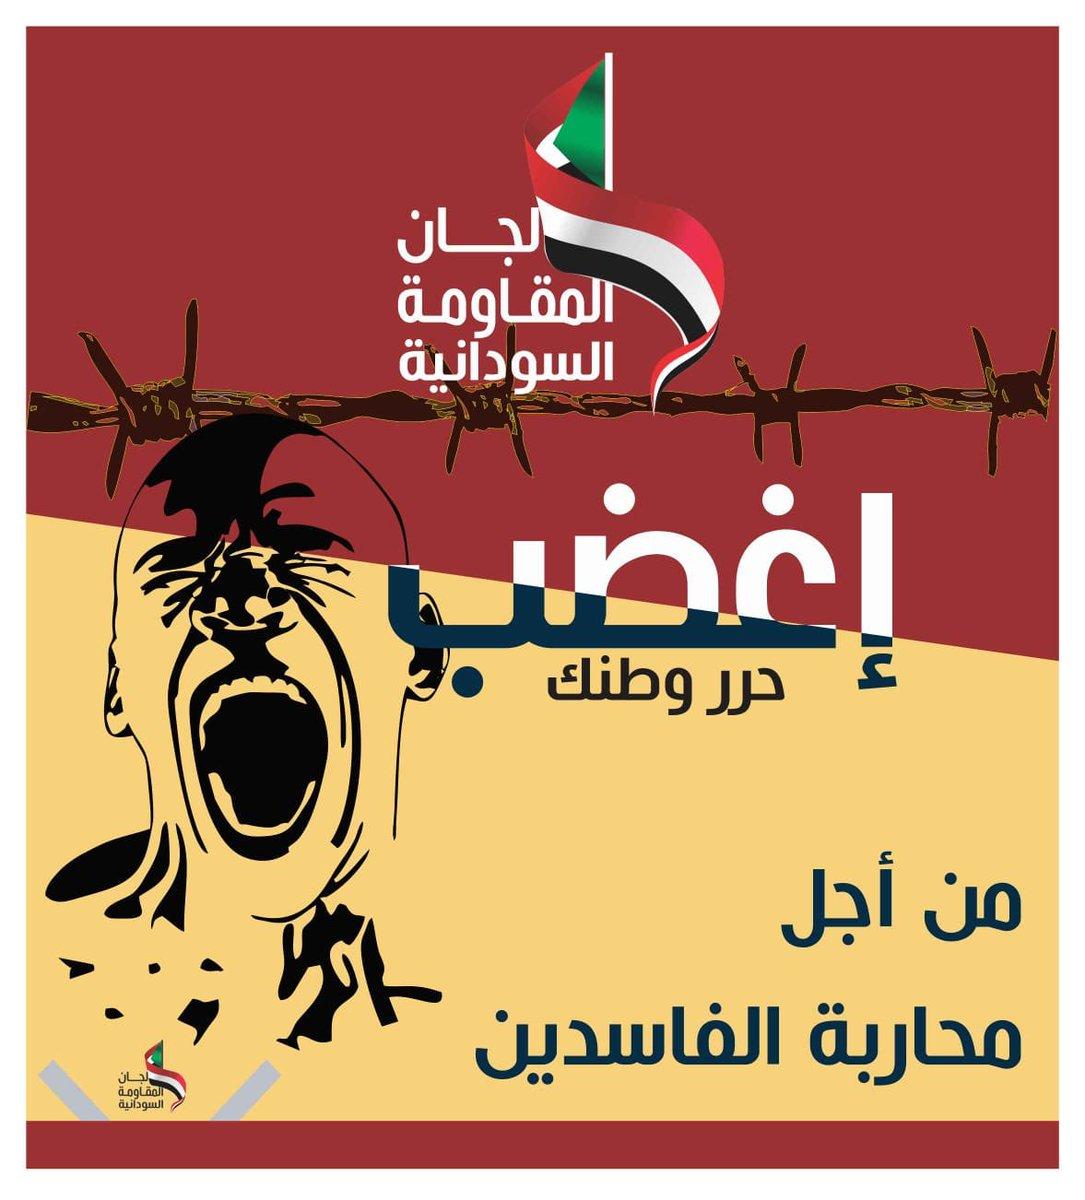 Sudan Political Developments: Starting The First Step Along A Big Shift